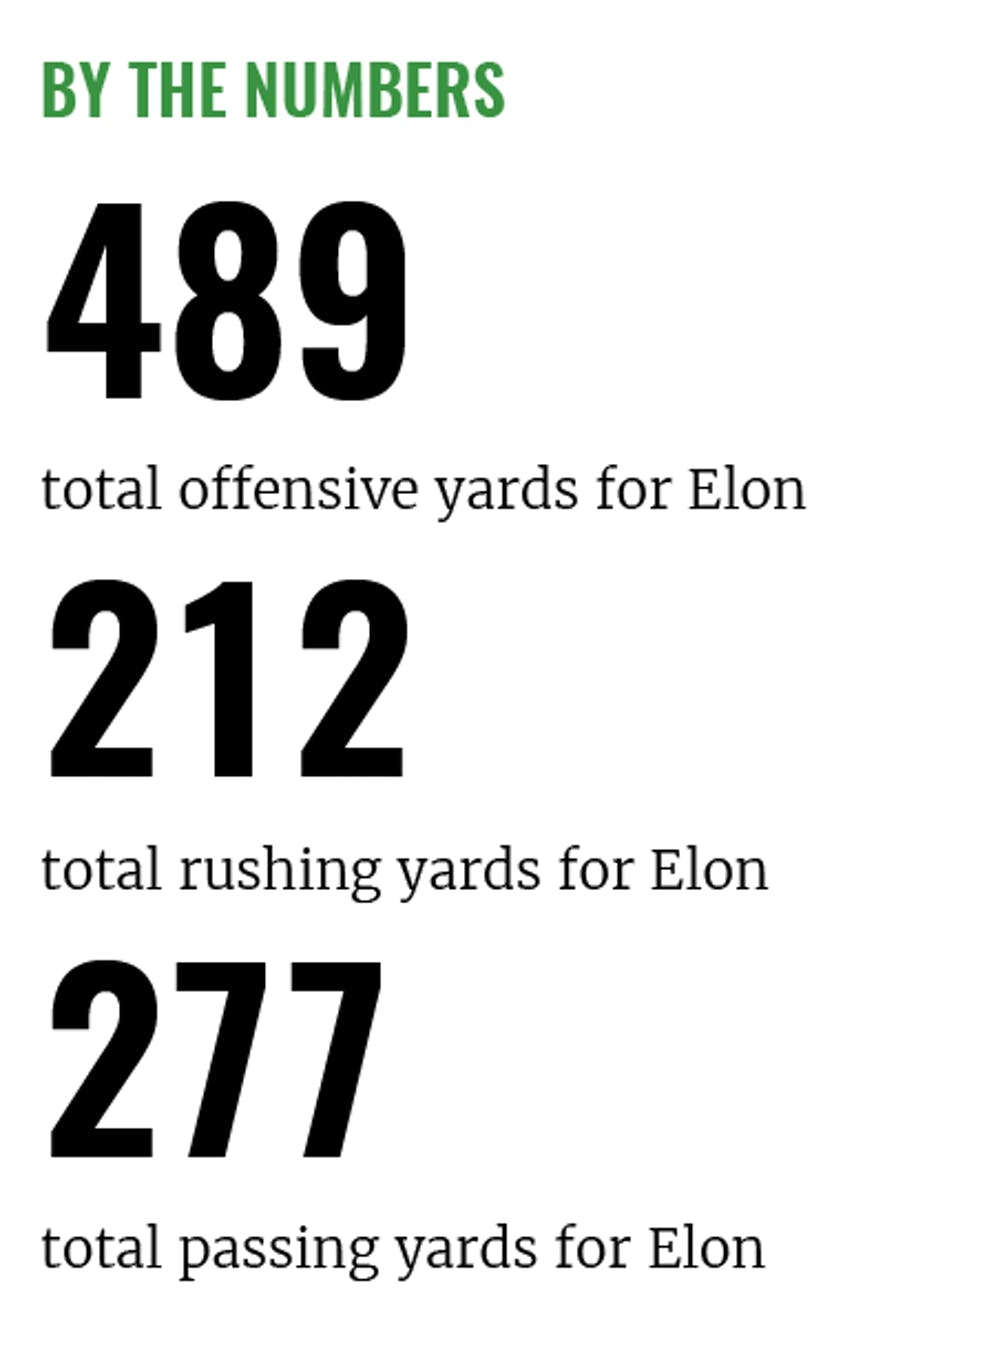 Legit at long last: Win over JMU redefining Elon football